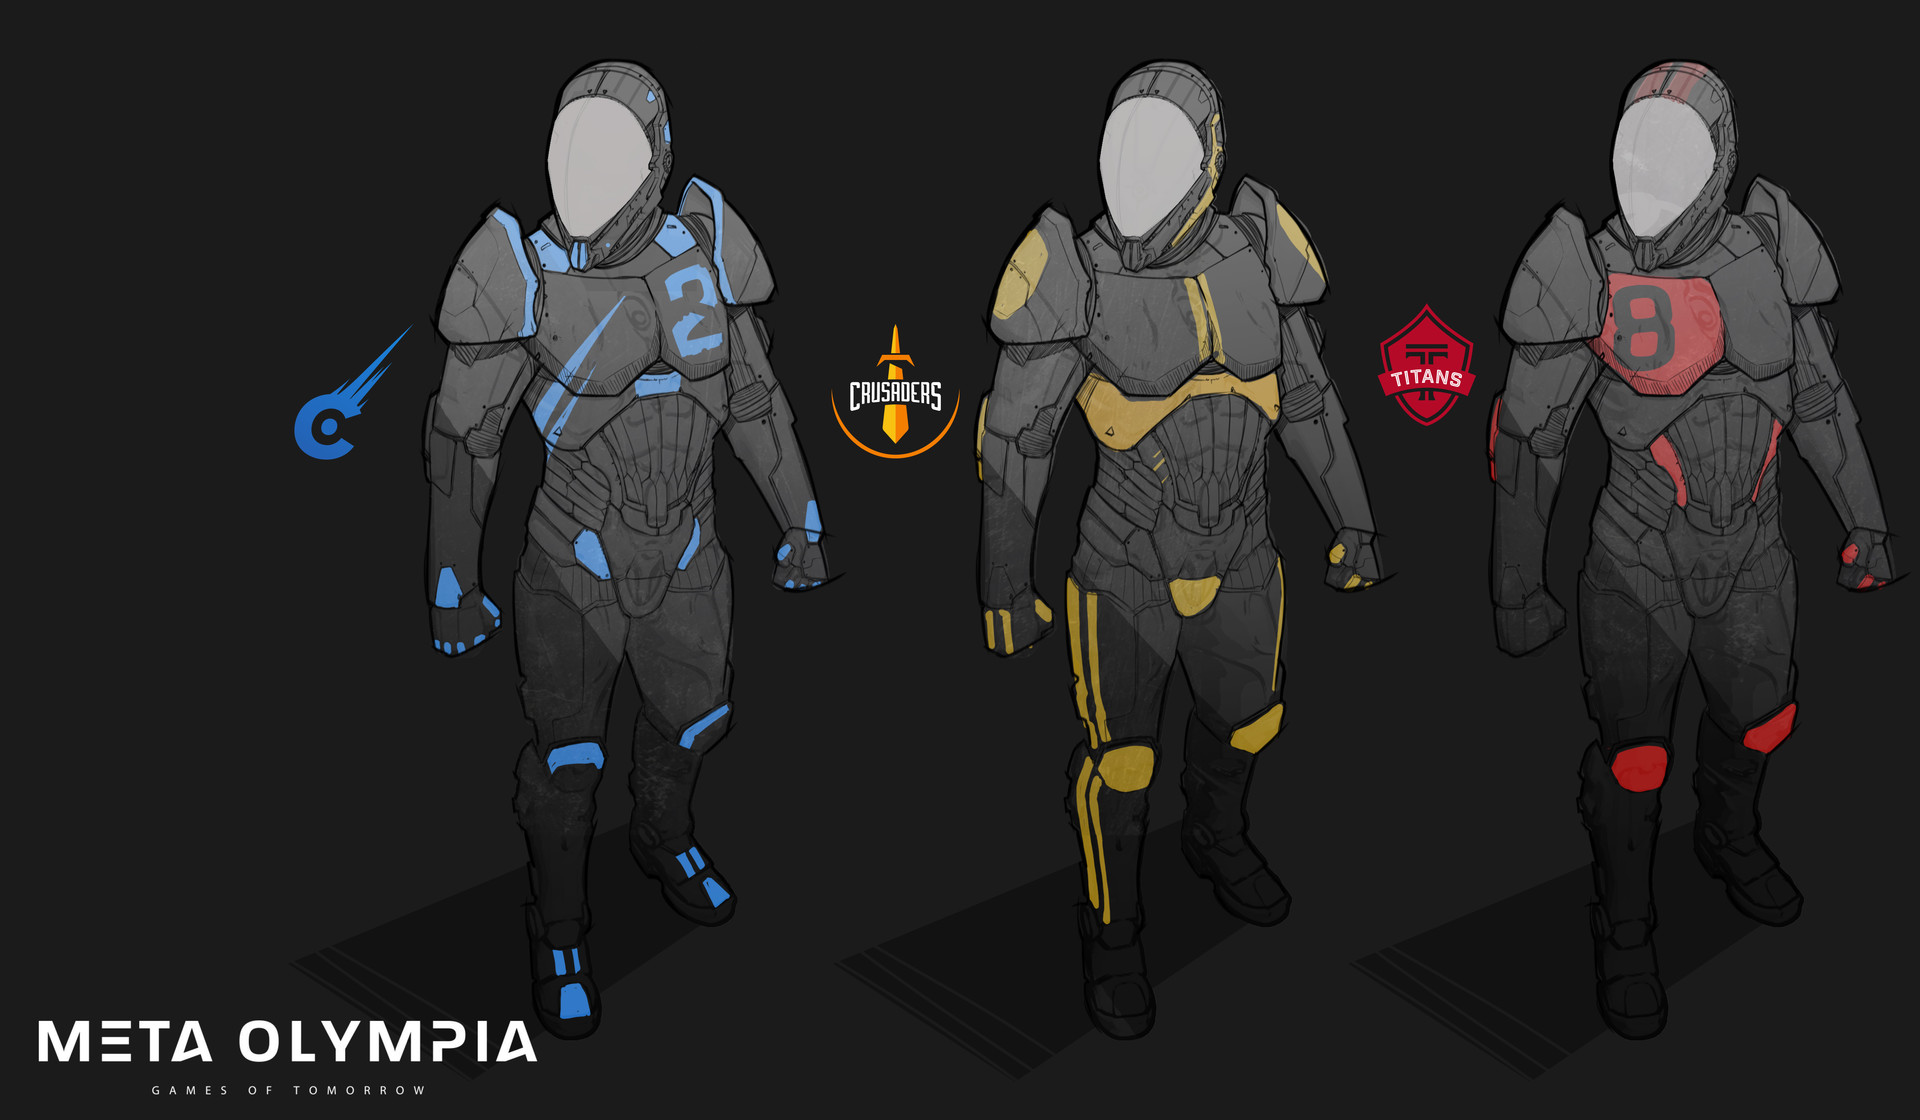 Meta olympia evsuit armor 1